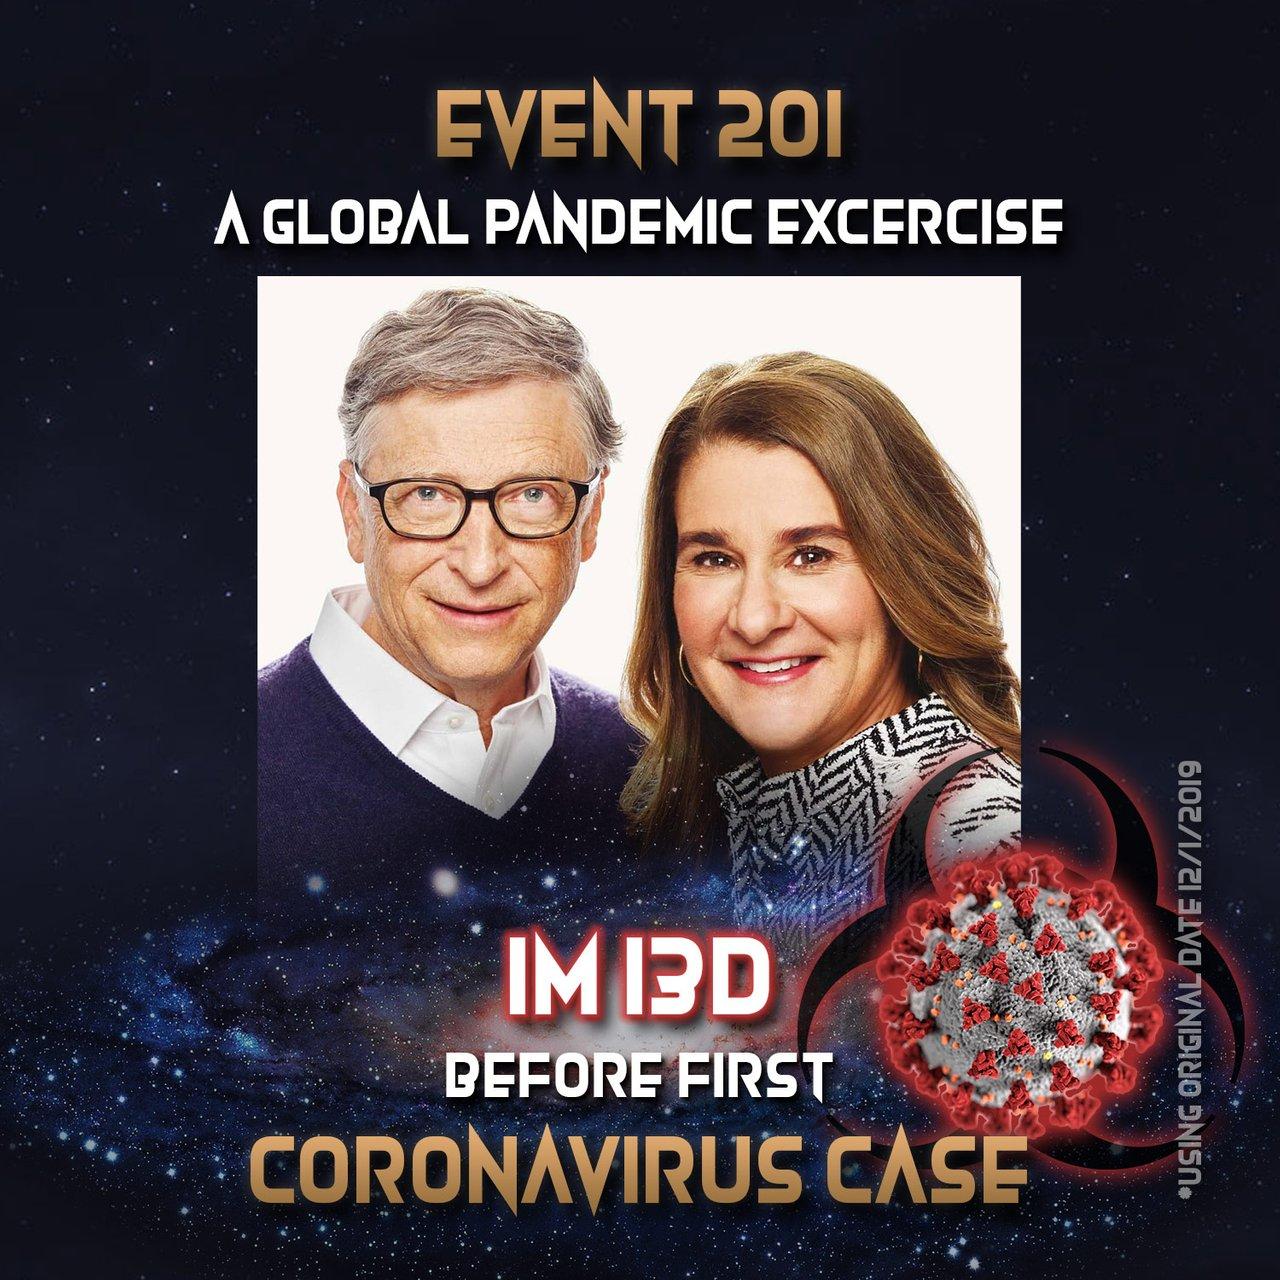 APX Event 201 113 Coronavirus.jpg